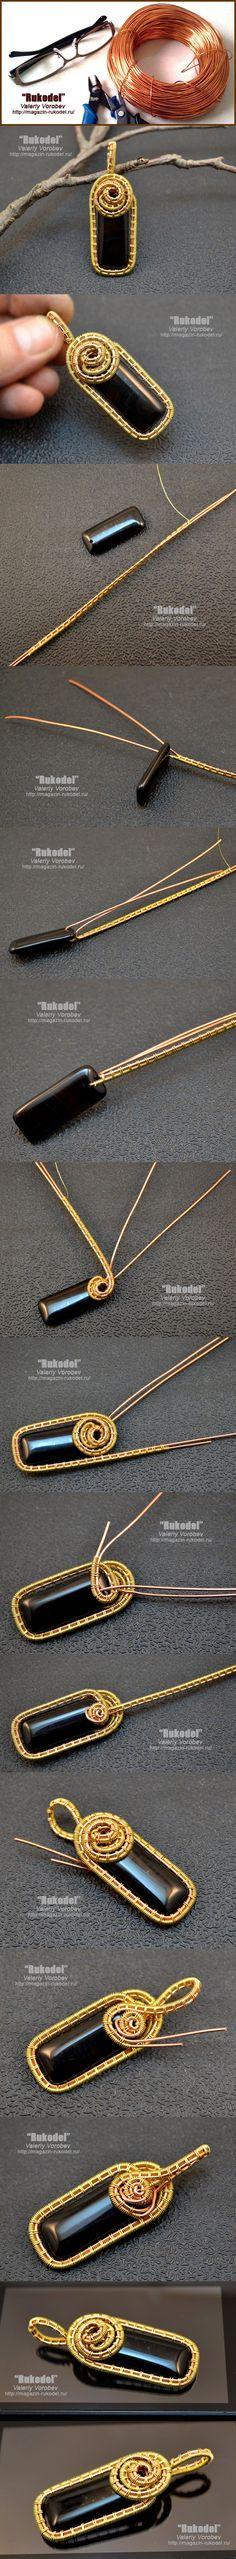 Tutorial DIY Wire Jewelry  Image    Description  Кулон из золотой и медной проволоки своими руками. | Рукодел